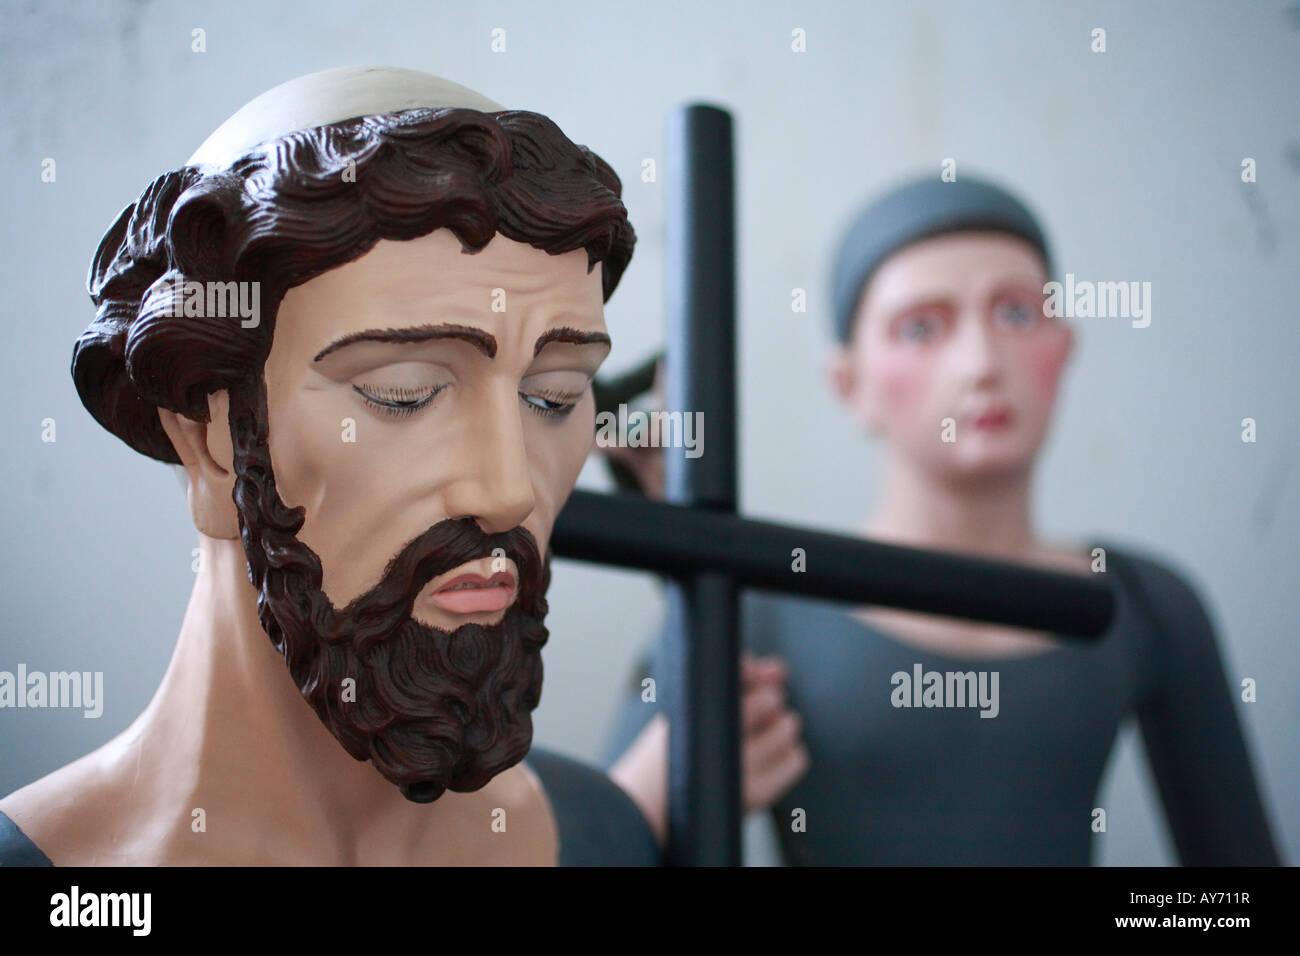 Closeup of the face of a catholic saint - Stock Image